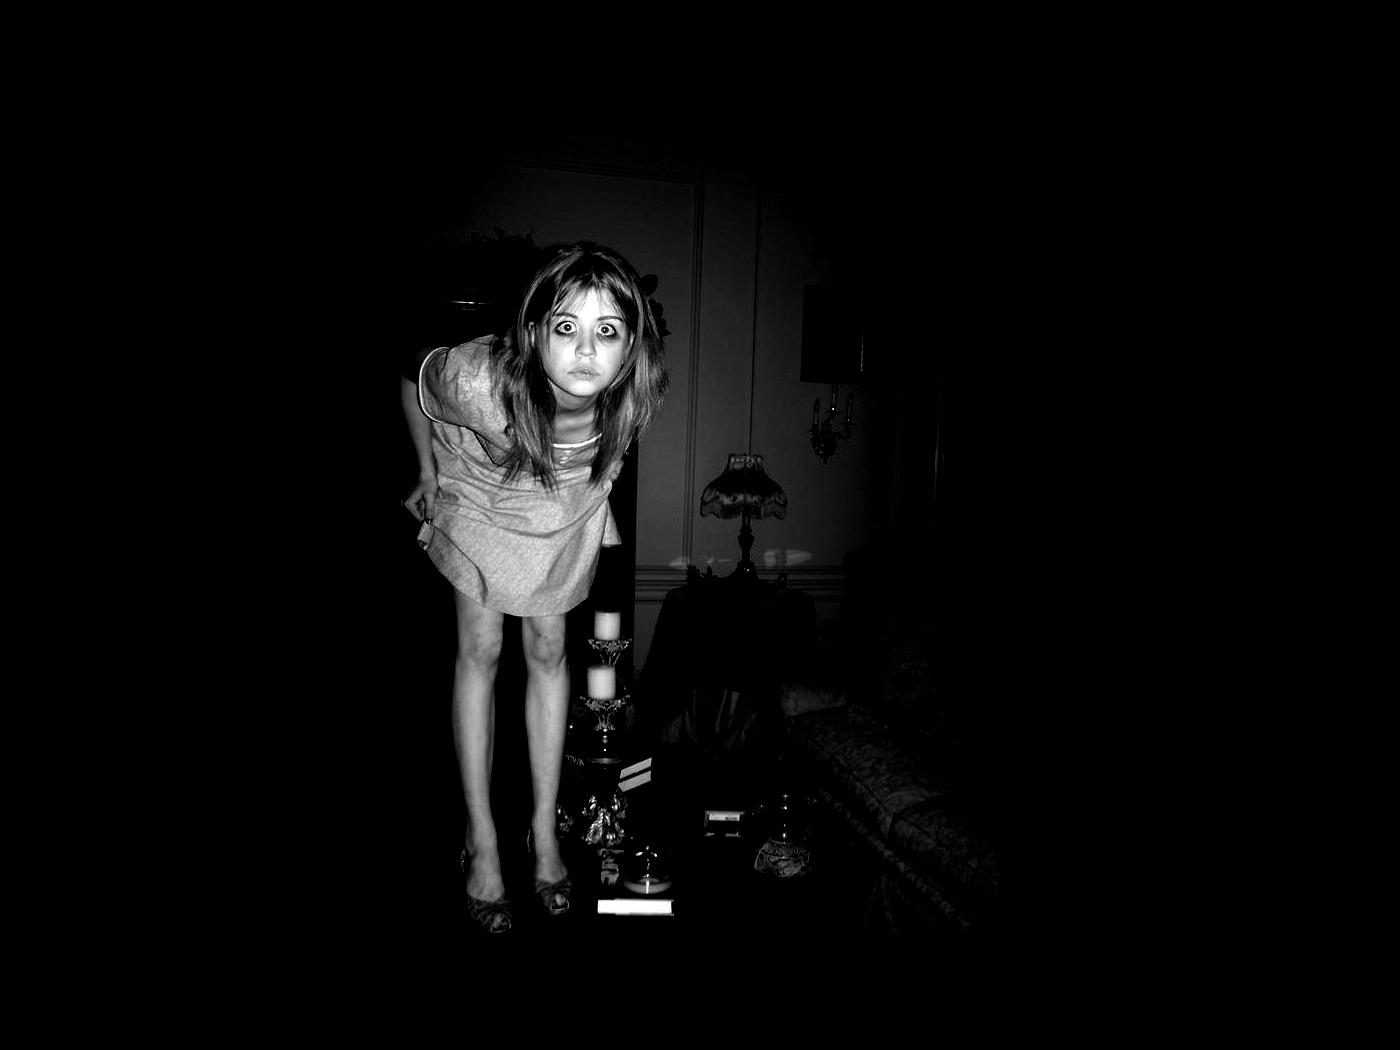 17 Best images about Creepy/Disturbing Art - Part 2 on ...  |Disturbing Dark Scary